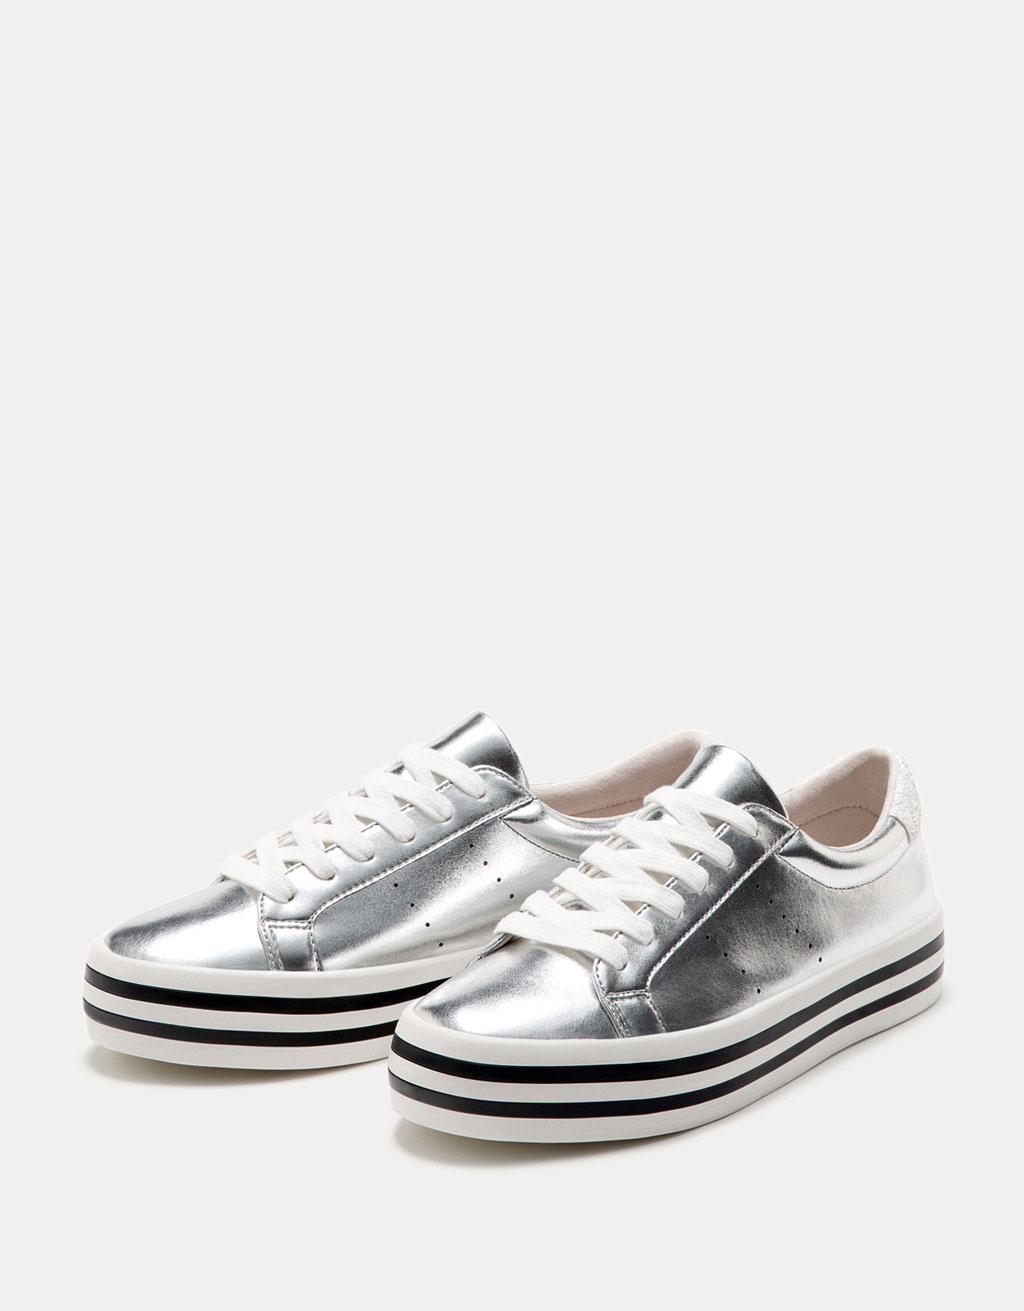 Sneaker in Metallic-Optik mit kombinierter Sohle